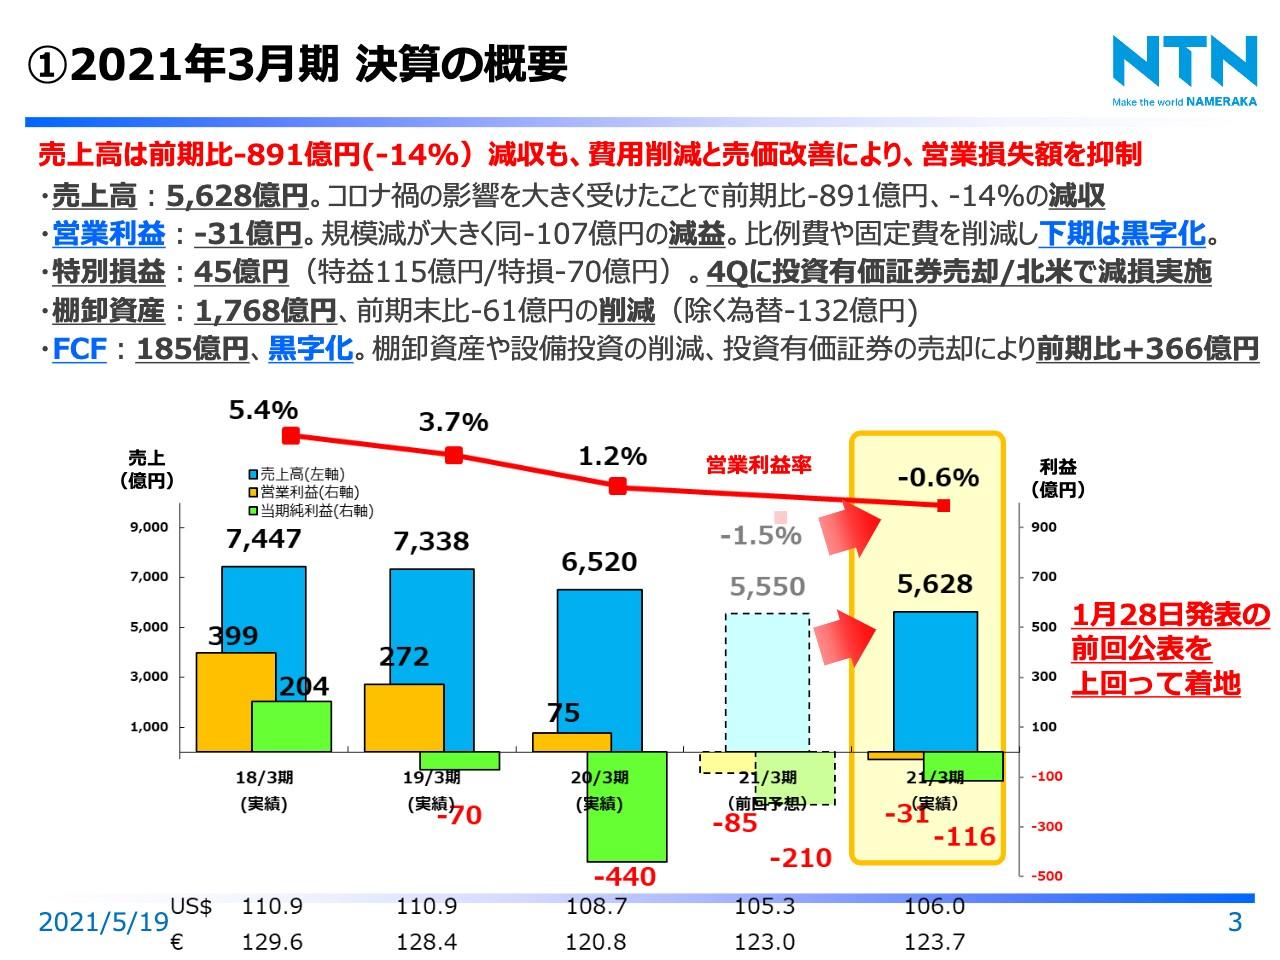 NTN、通期はコロナ影響を受け減収減益も比例費や人件費等の固定費削減を進め、下期は黒字化